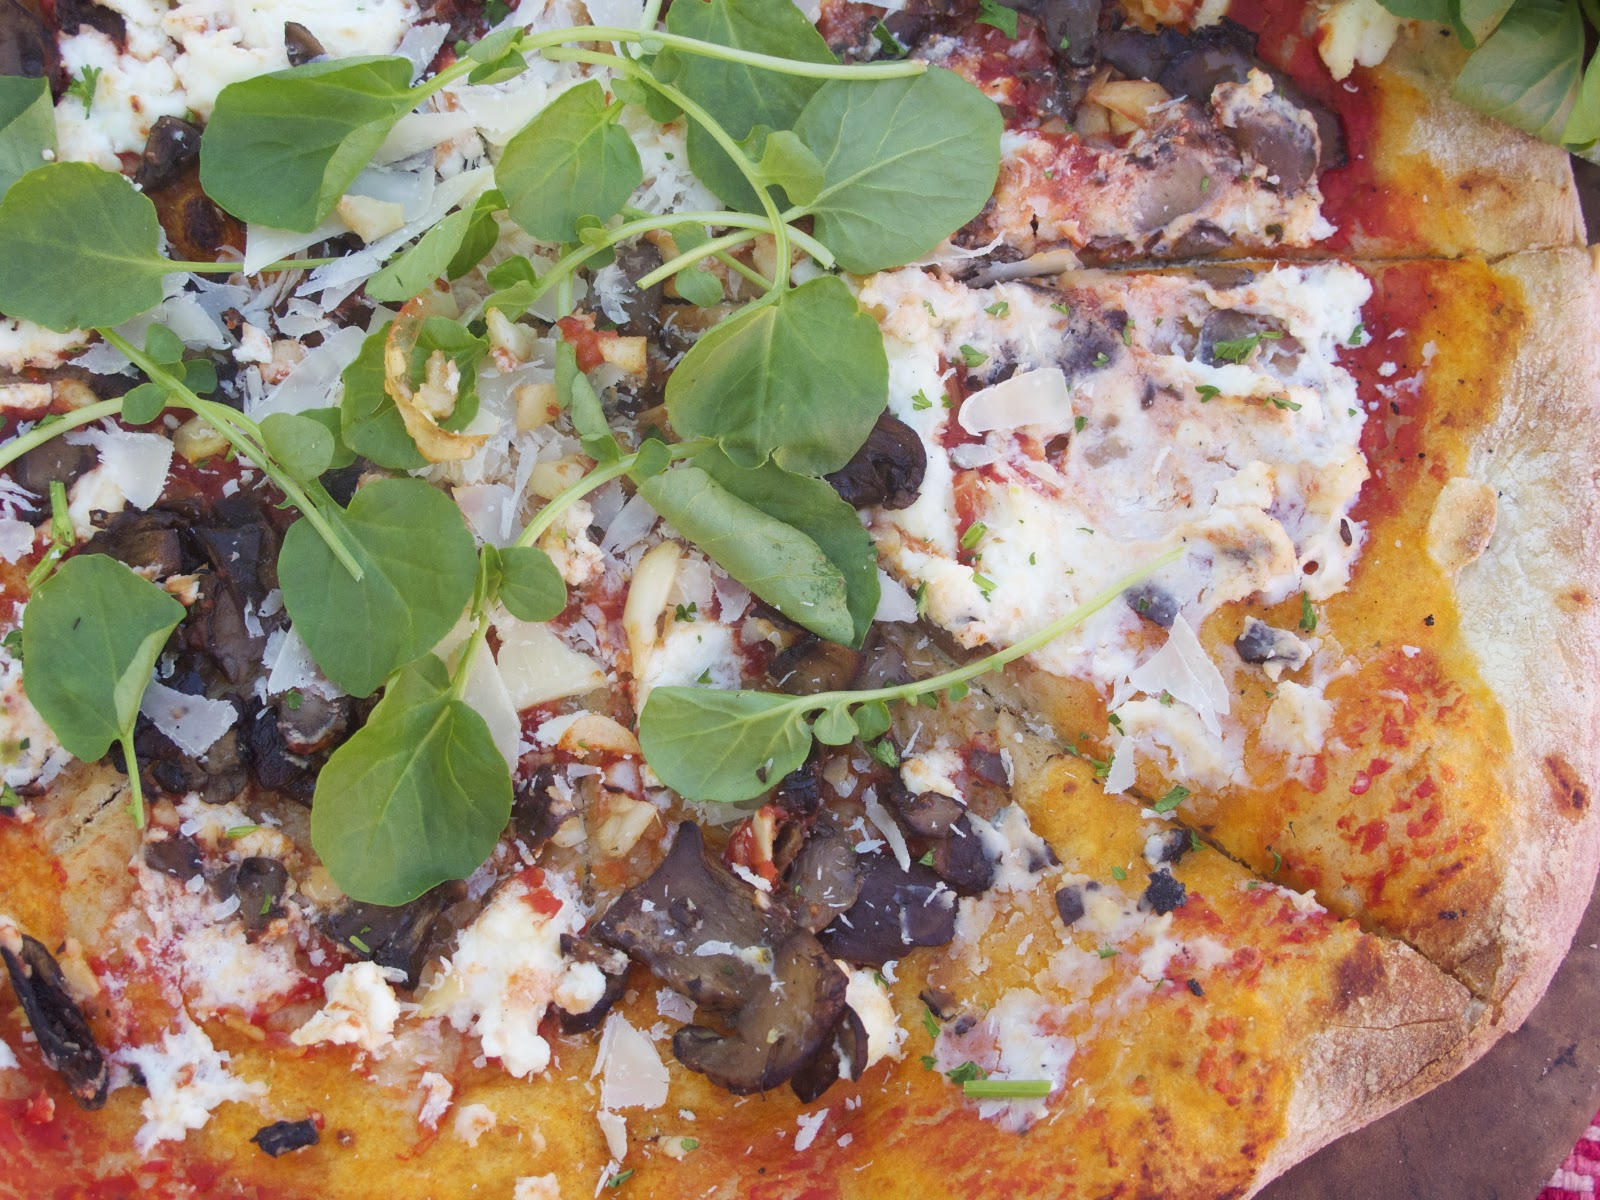 Simply Healthy Family: Ricotta, Garlic and Mushroom Thin Crust Pizza ...